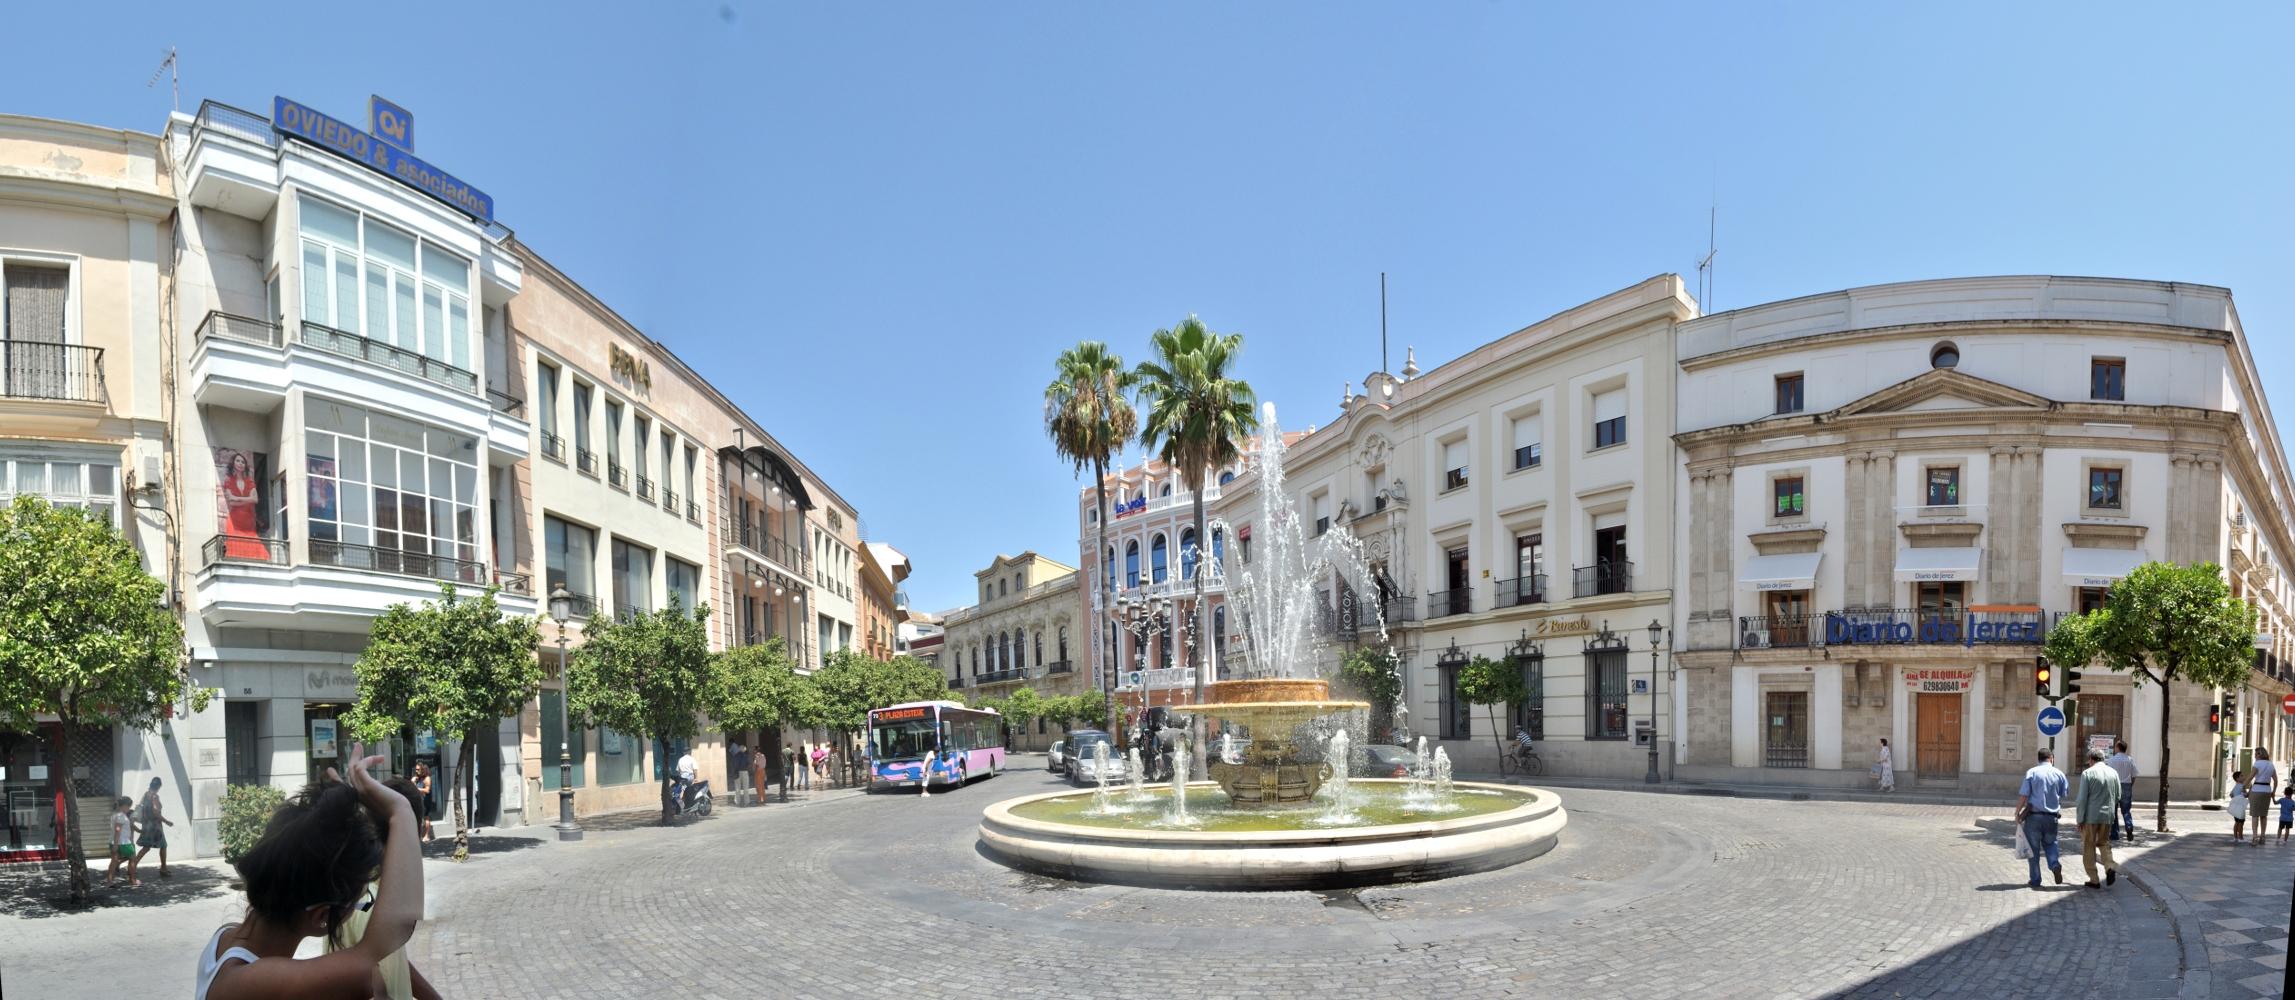 Archivo rotonda casino panoramica jerez wikipedia for Calle prado jerez madrid